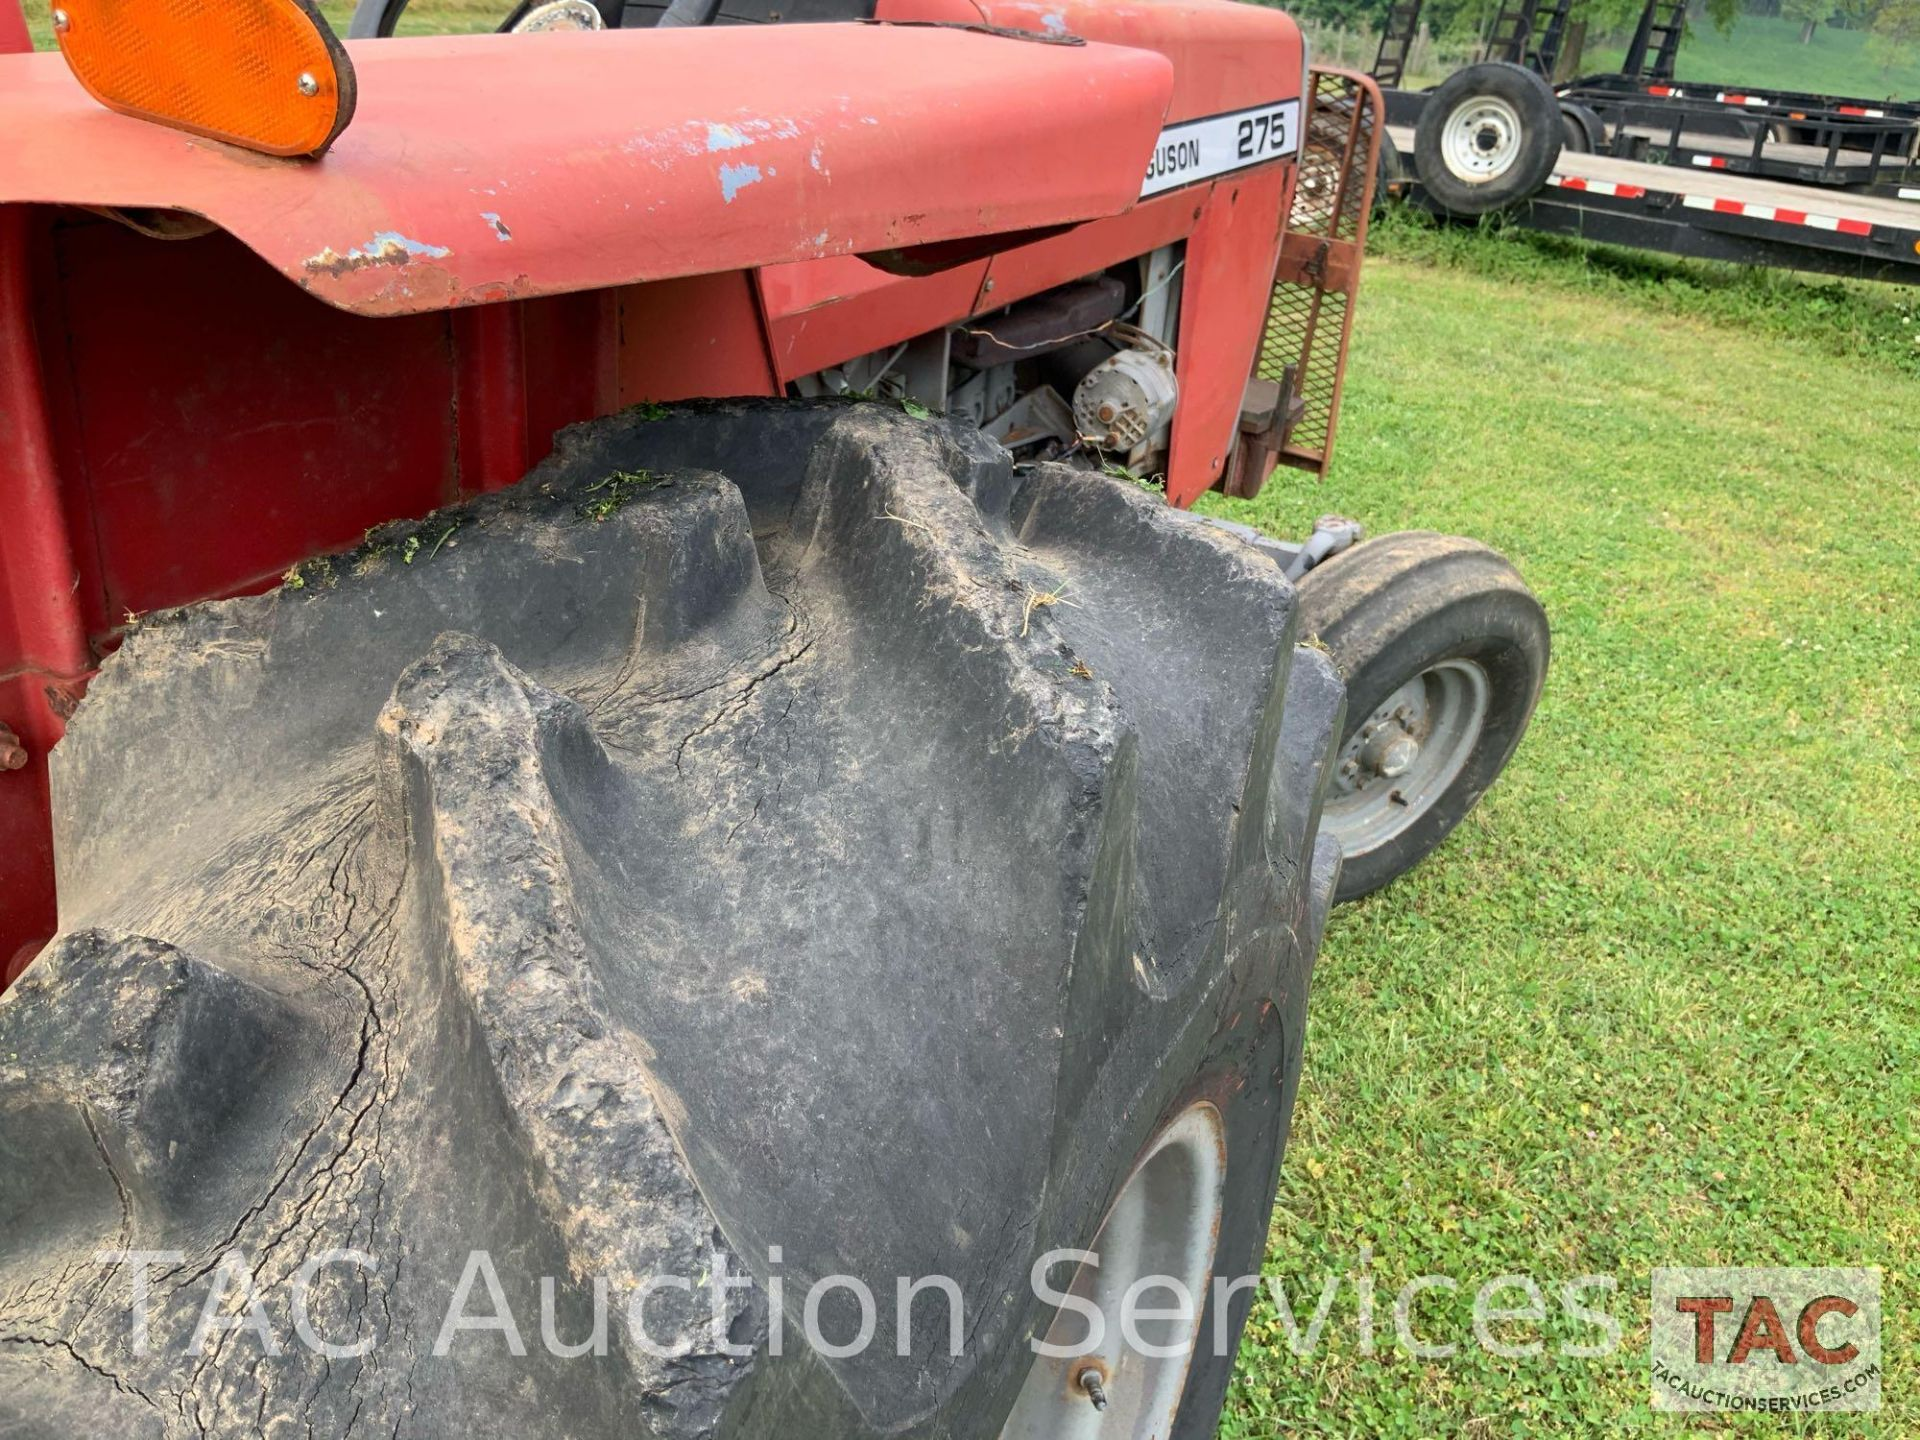 Massey Ferguson 275 Farm Tractor - Image 13 of 25